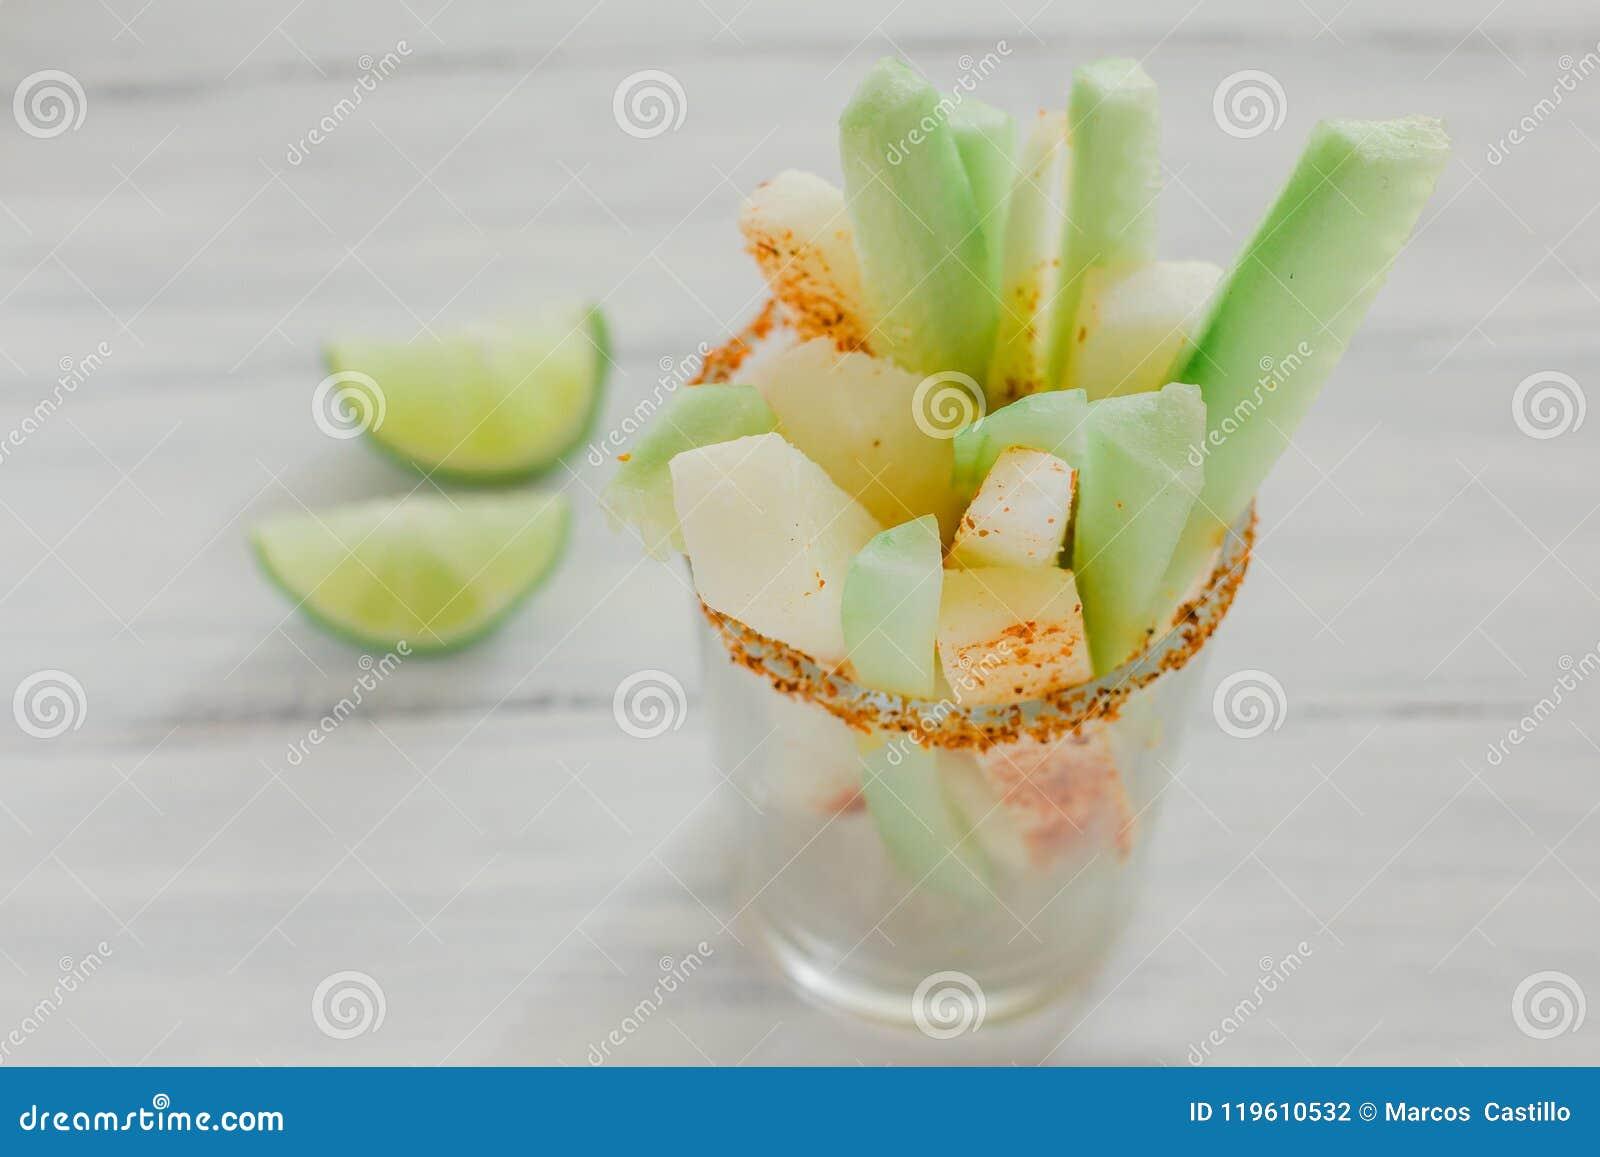 Pepinos And Jicama Con Chile, Cucumber And Jicamas With Chili ...